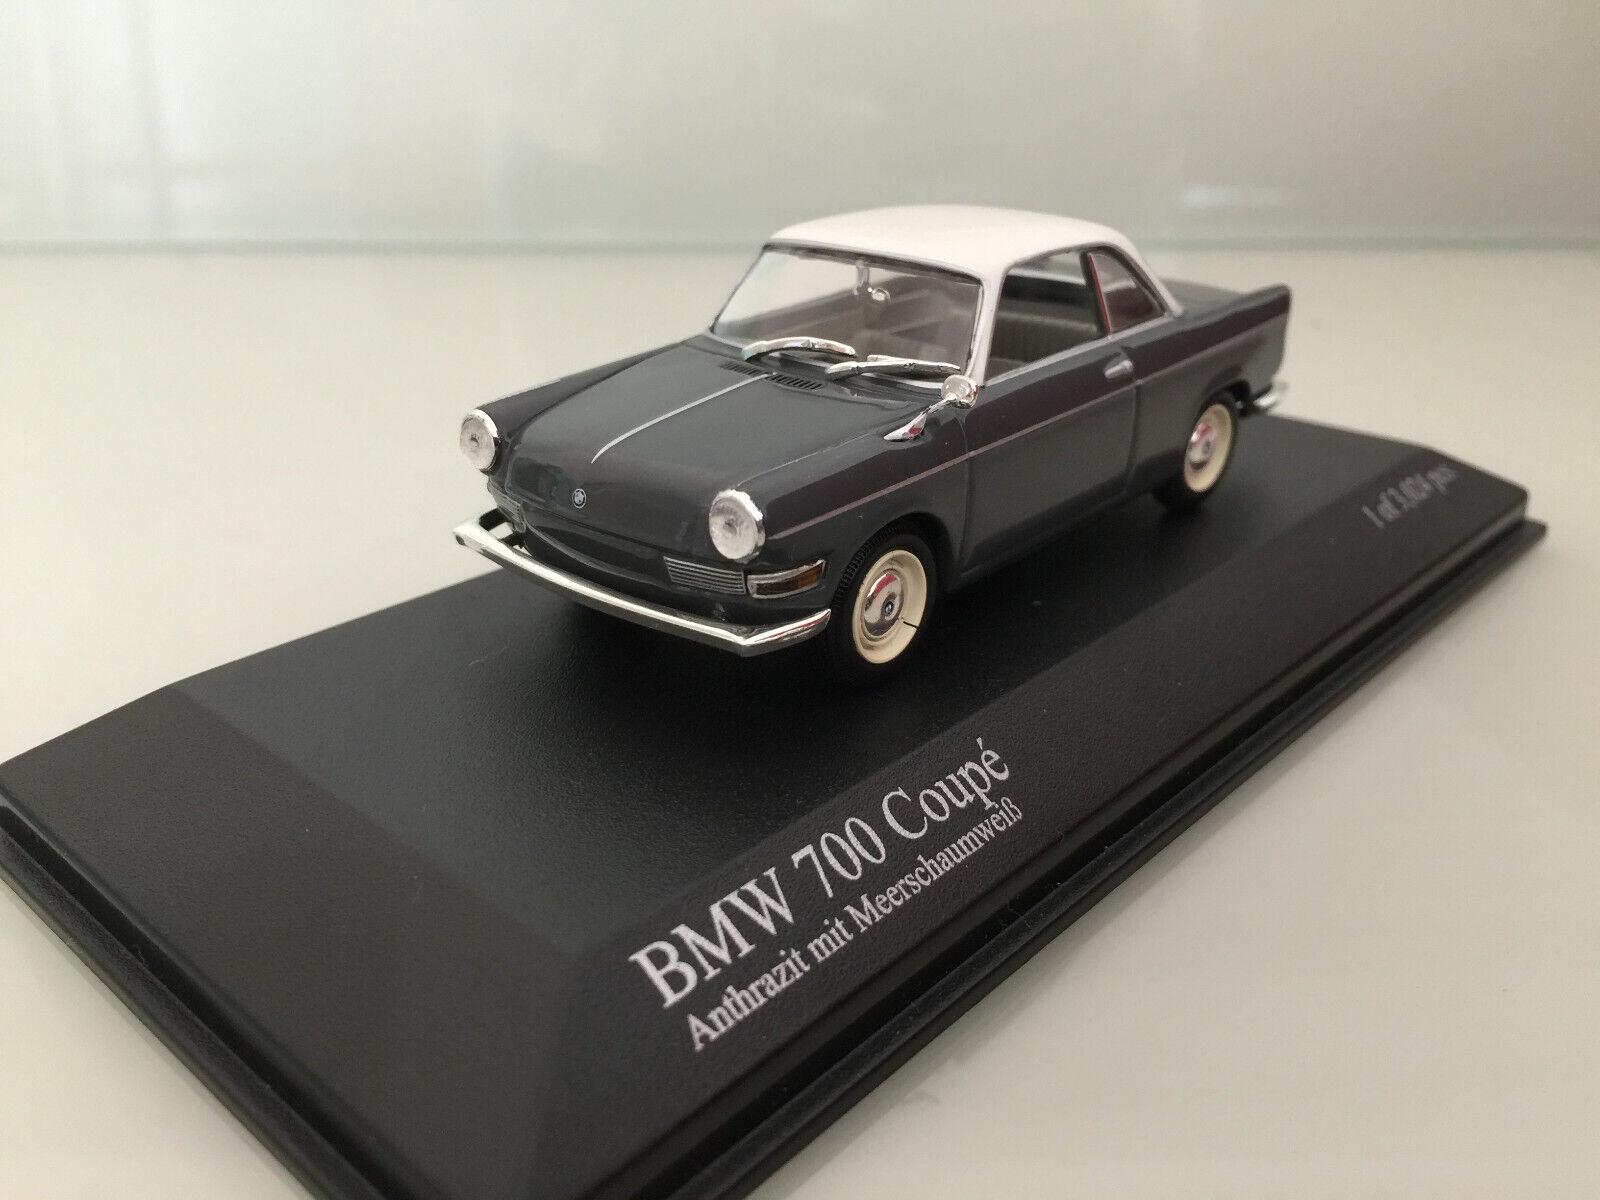 1 43 Minichamps BMW 700 Coupe , 1960 1960 1960 , Anthrazit Meerschaumwhite 3b8